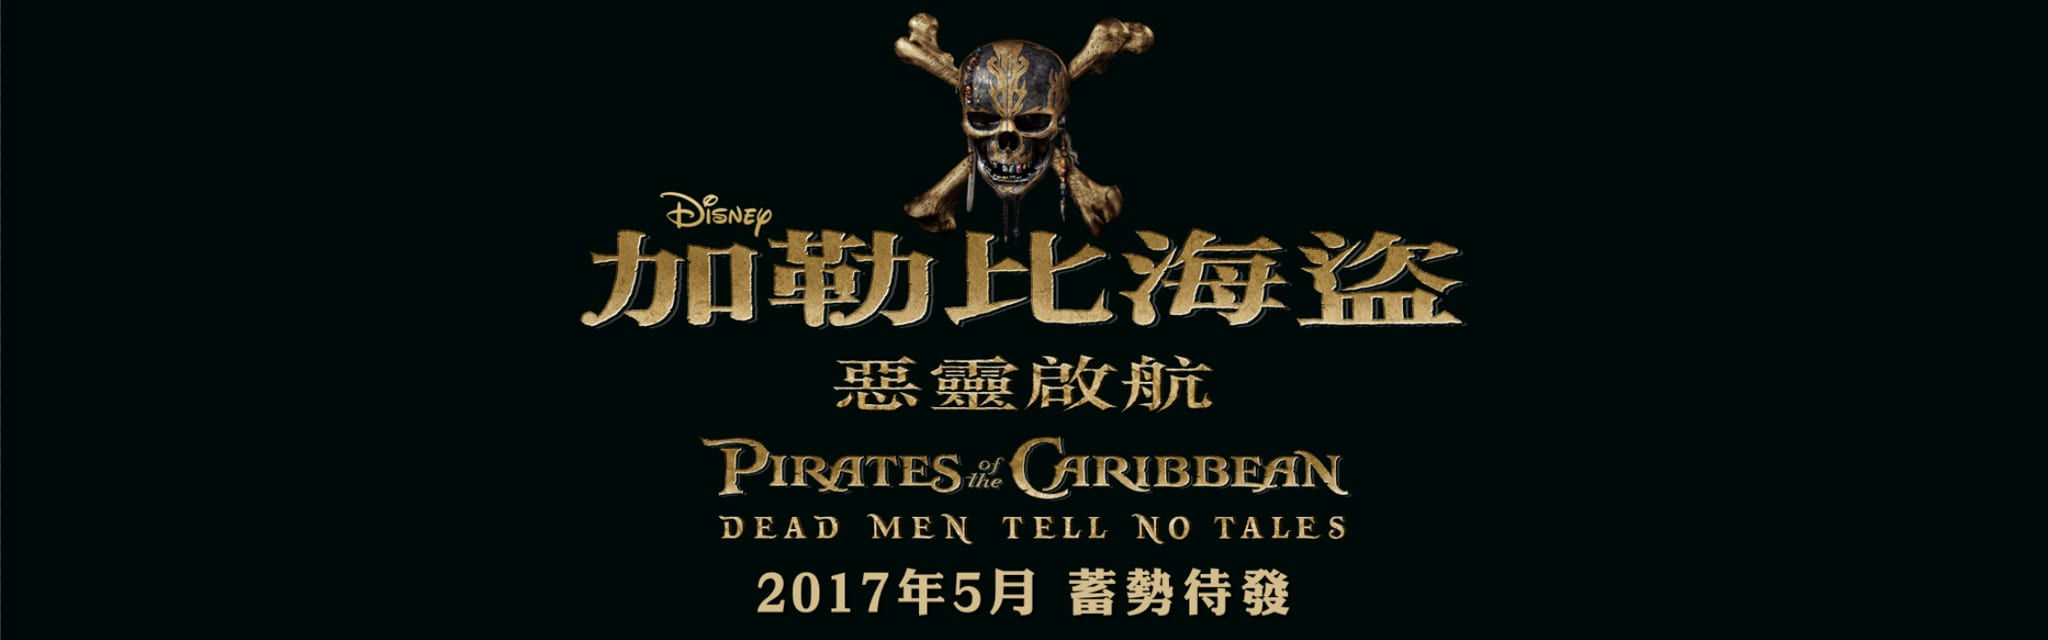 POTC - Disney HK